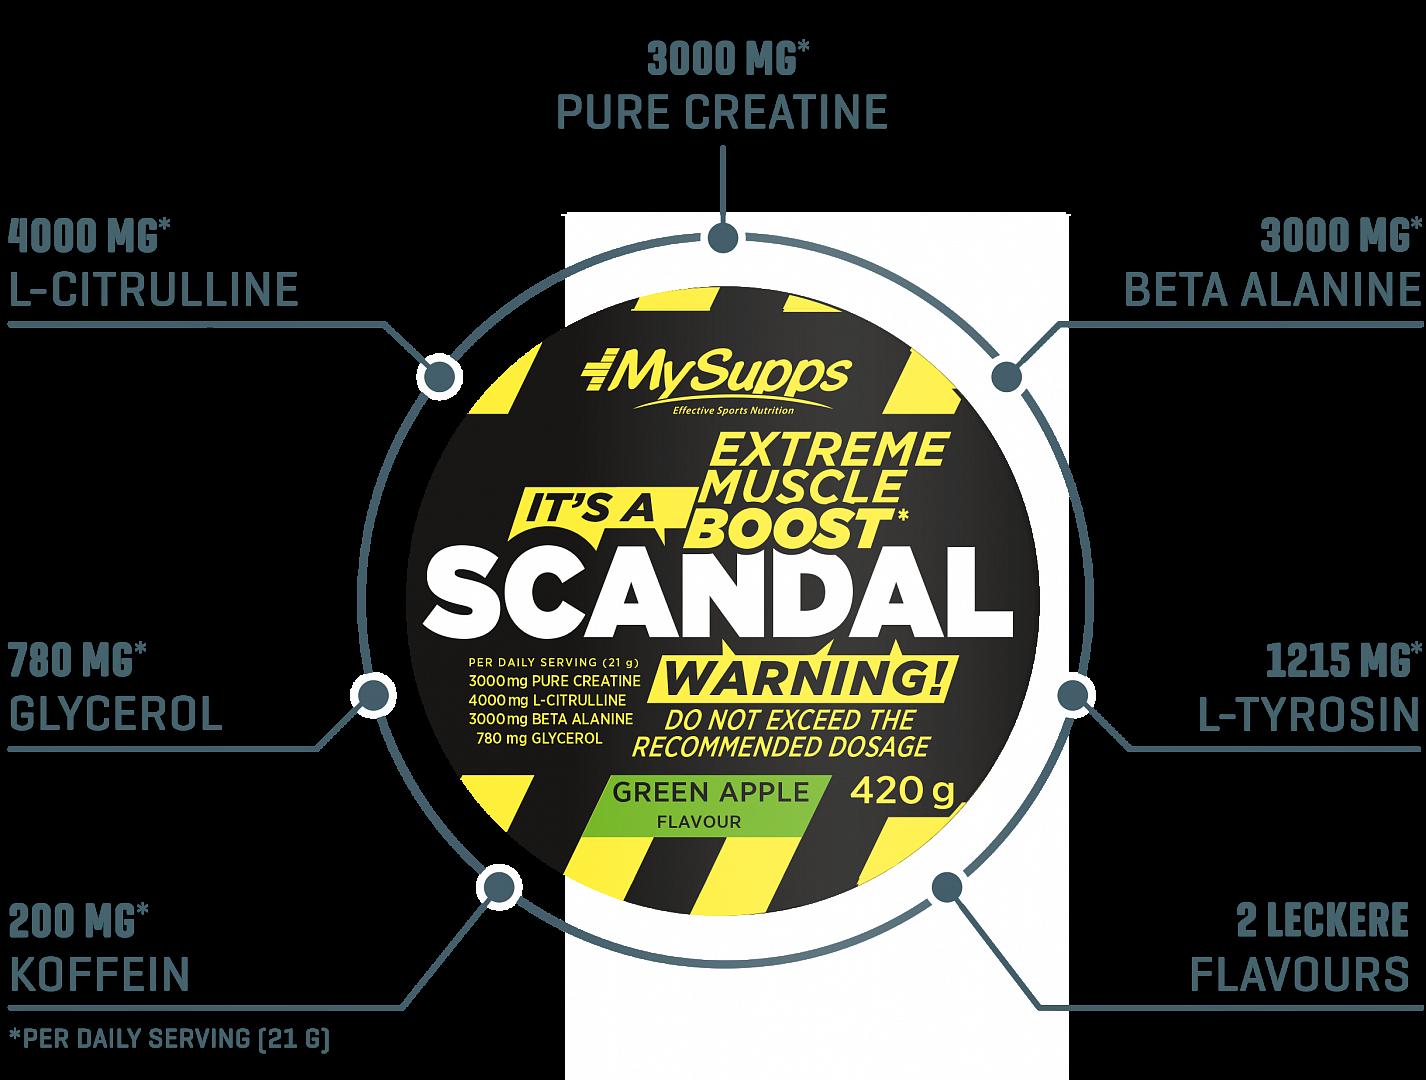 Scandal Info